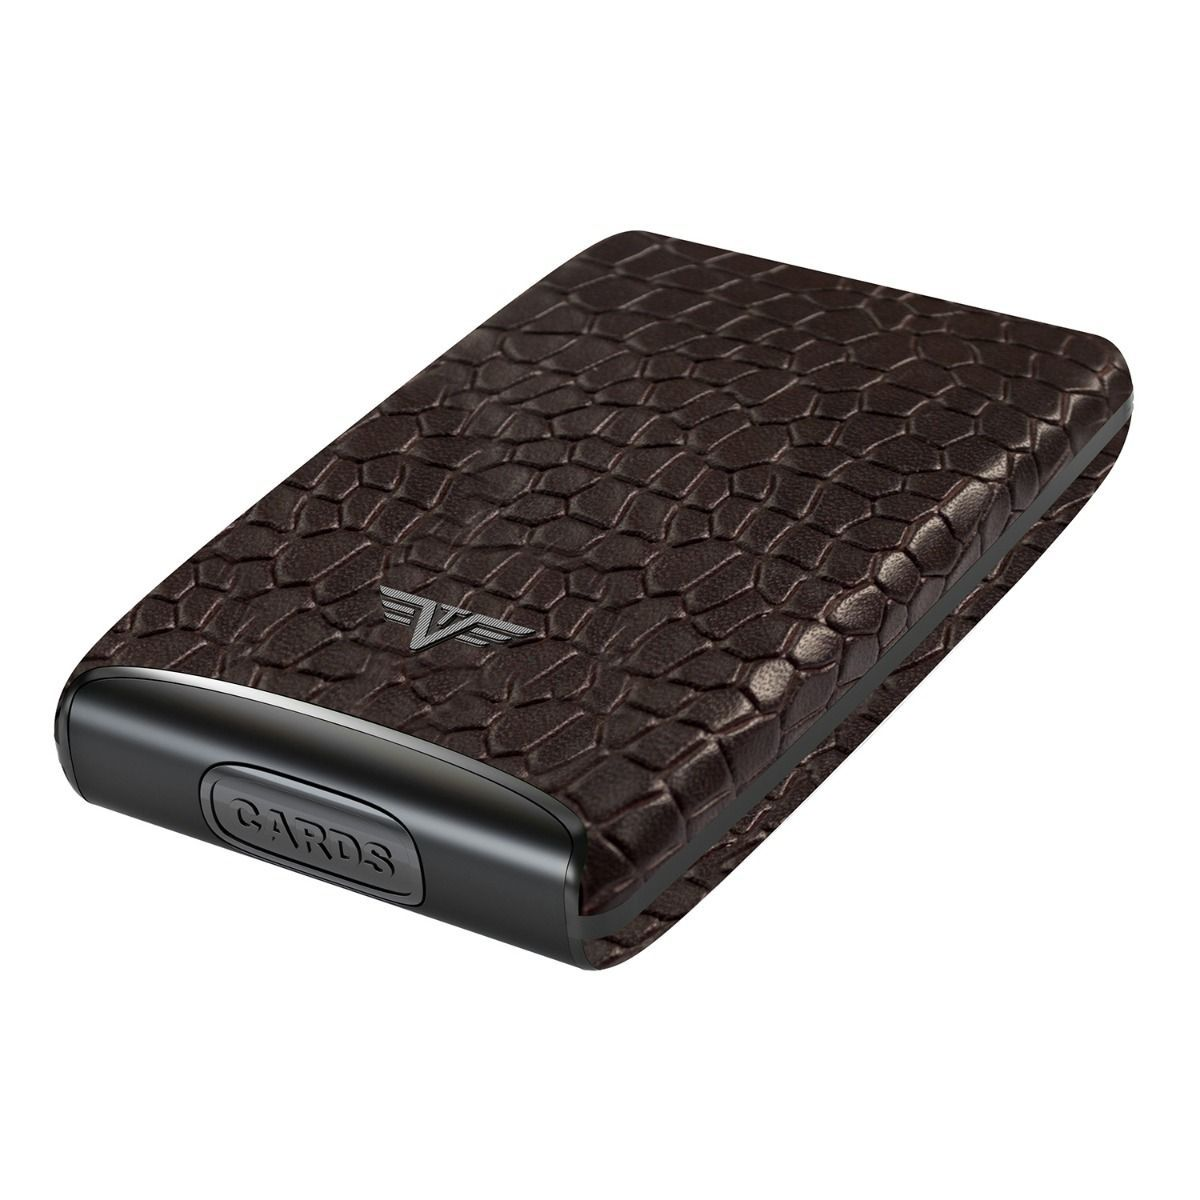 TRU VIRTU Aluminum Card Case Fan Leather Line - Corco Brown